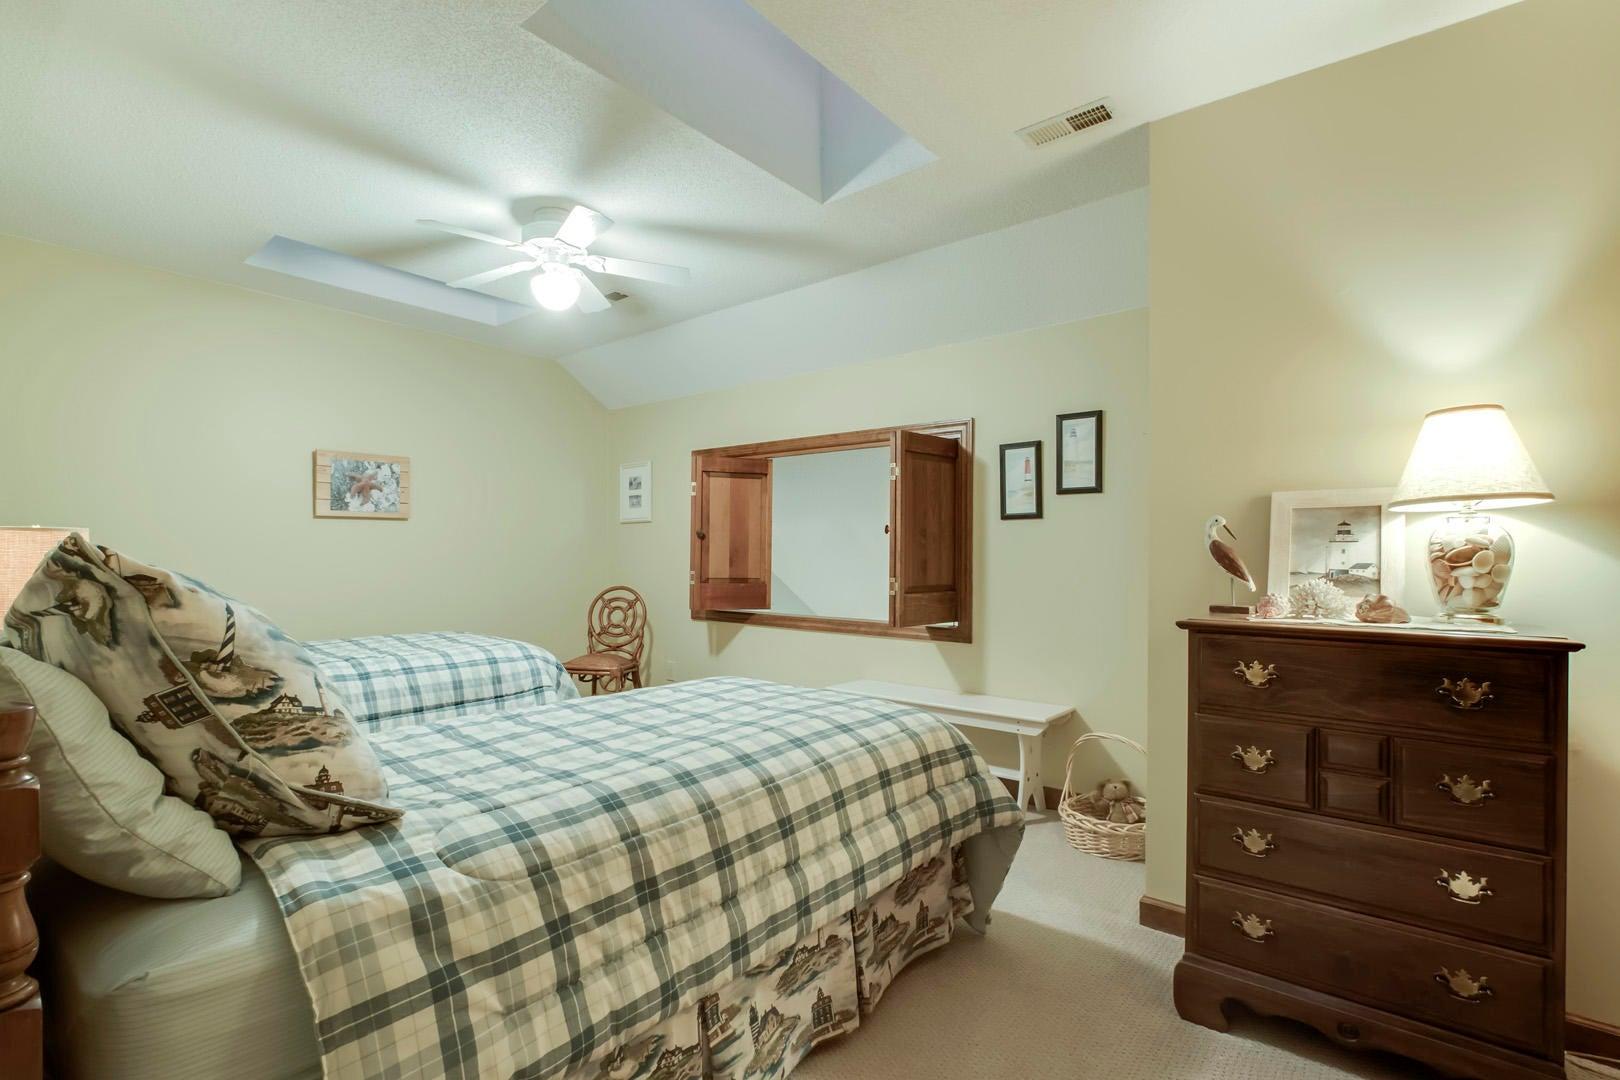 29_252 Chatuga Way_Bedroom3